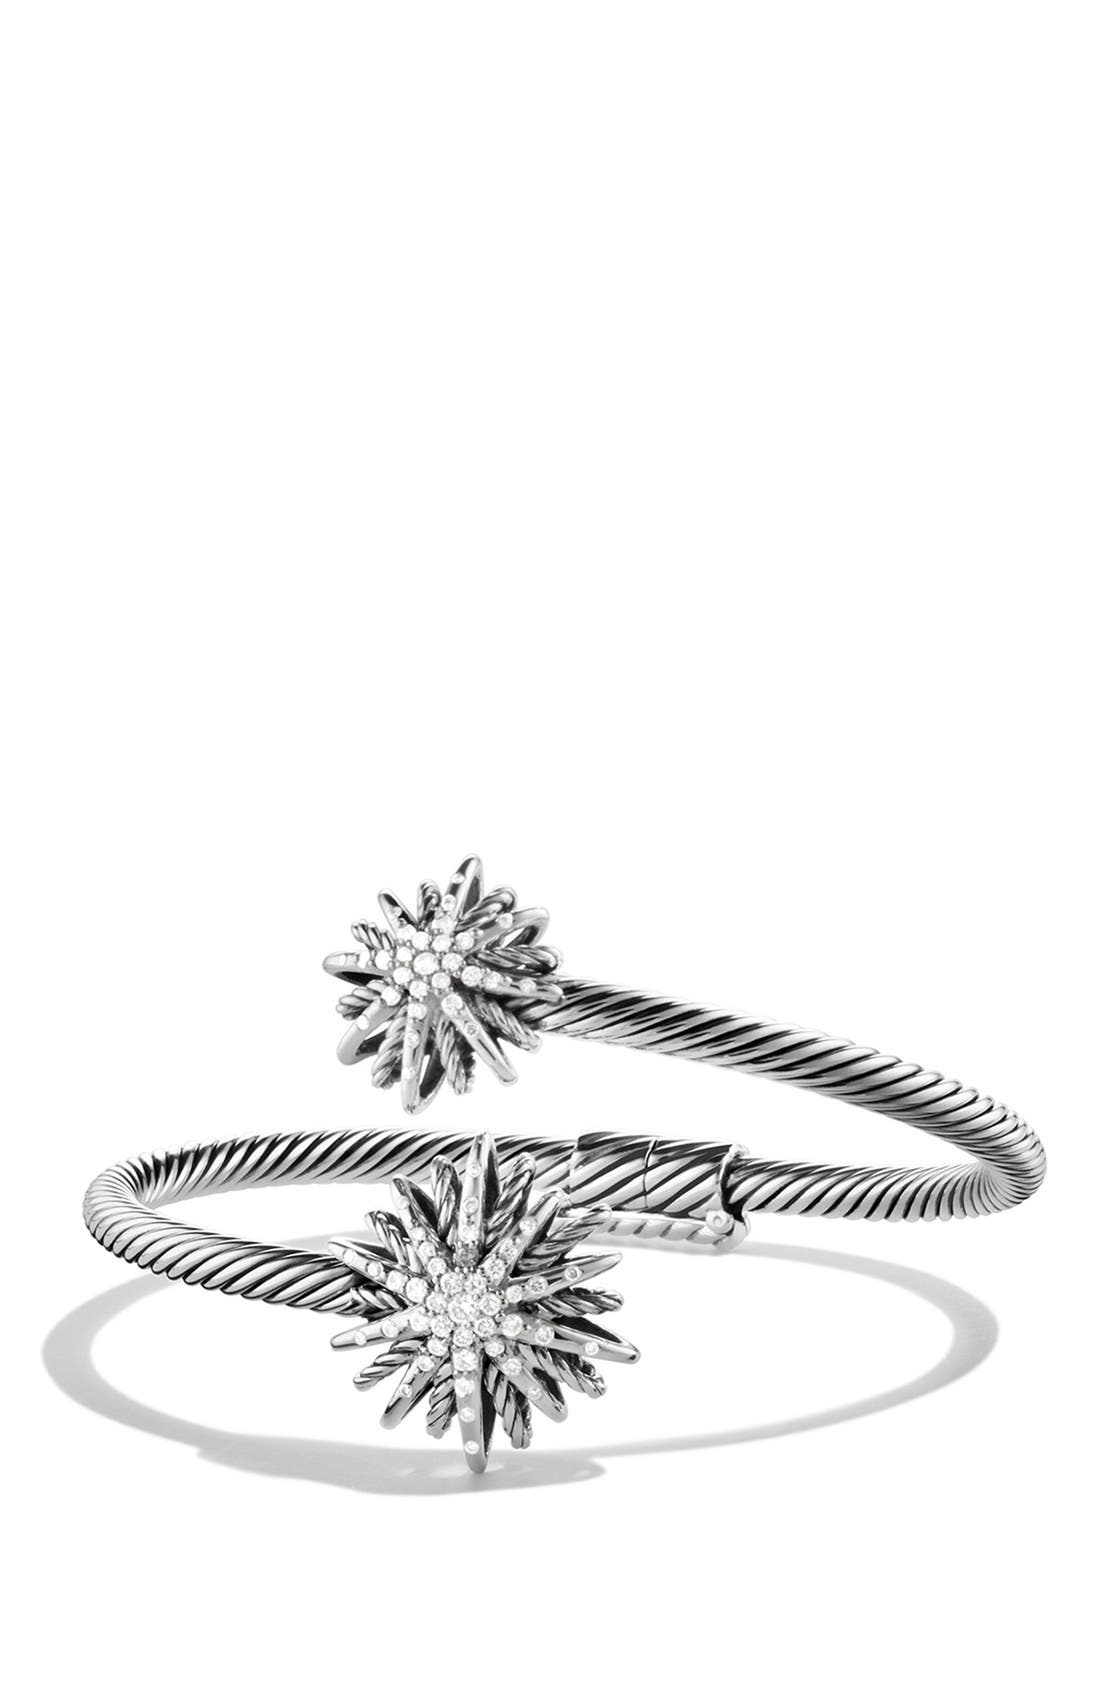 David Yurman 'Starburst' Diamond Coil Bracelet